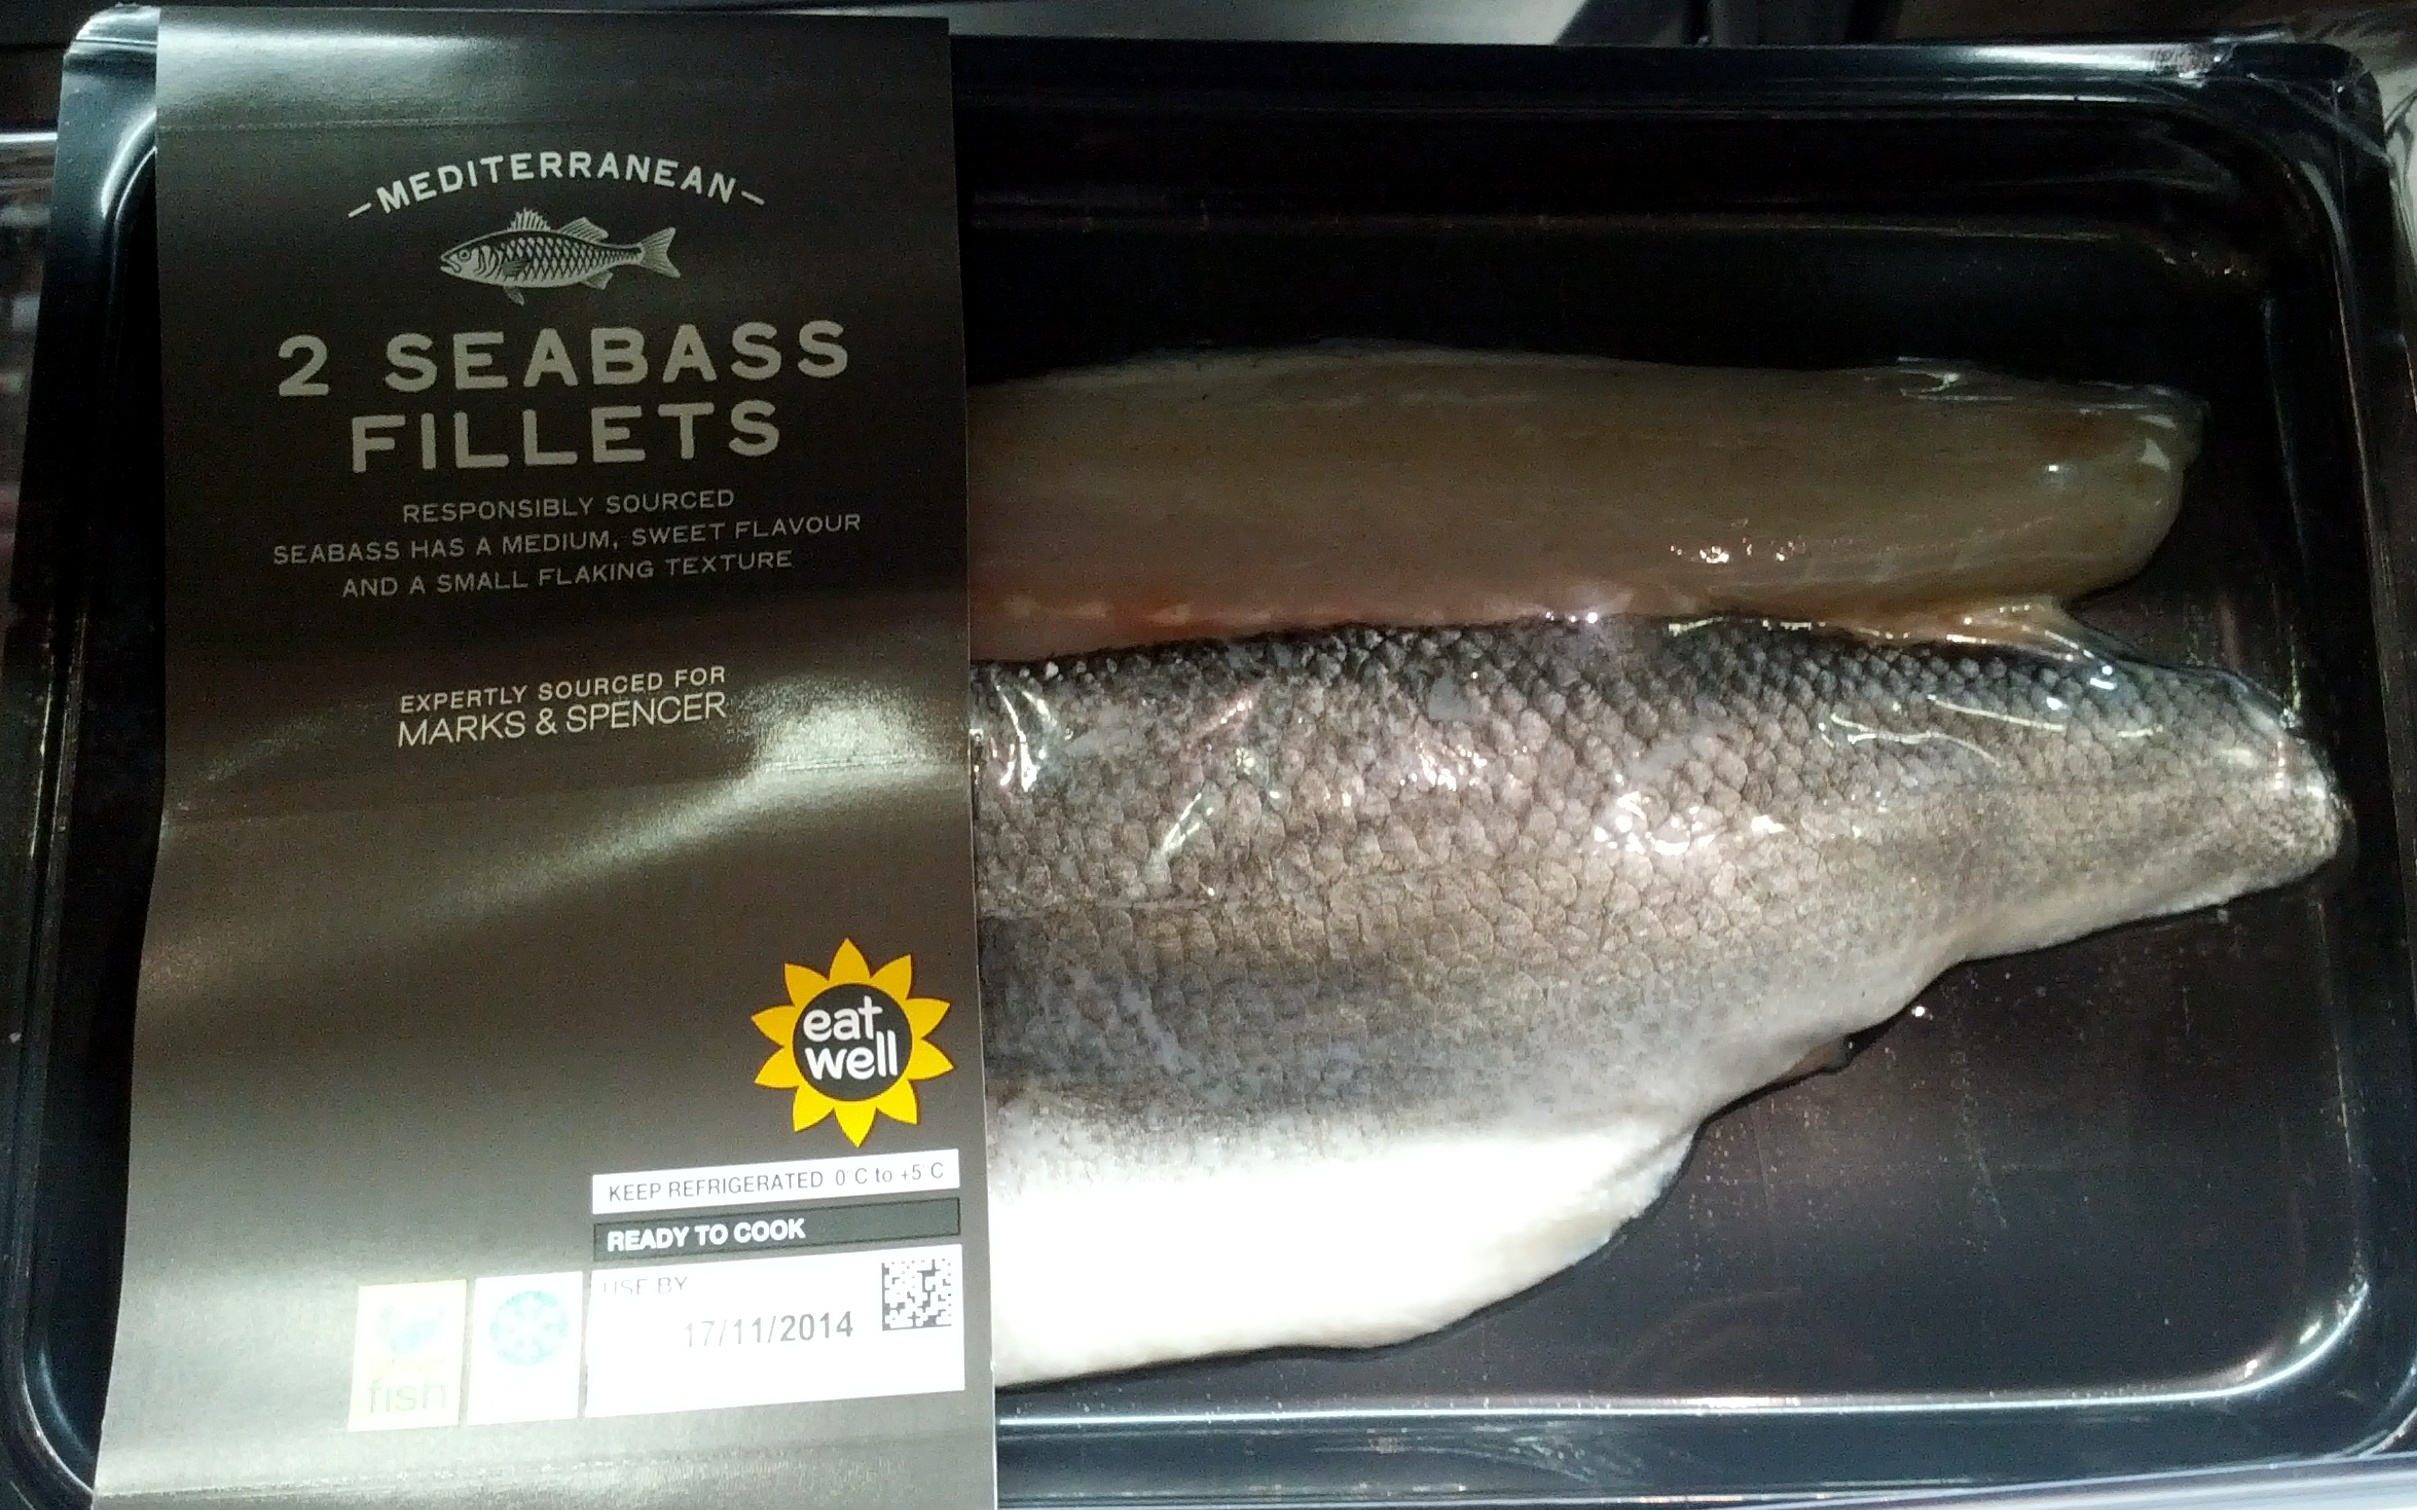 2 Mediterranean Seabass Fillets - Product - en